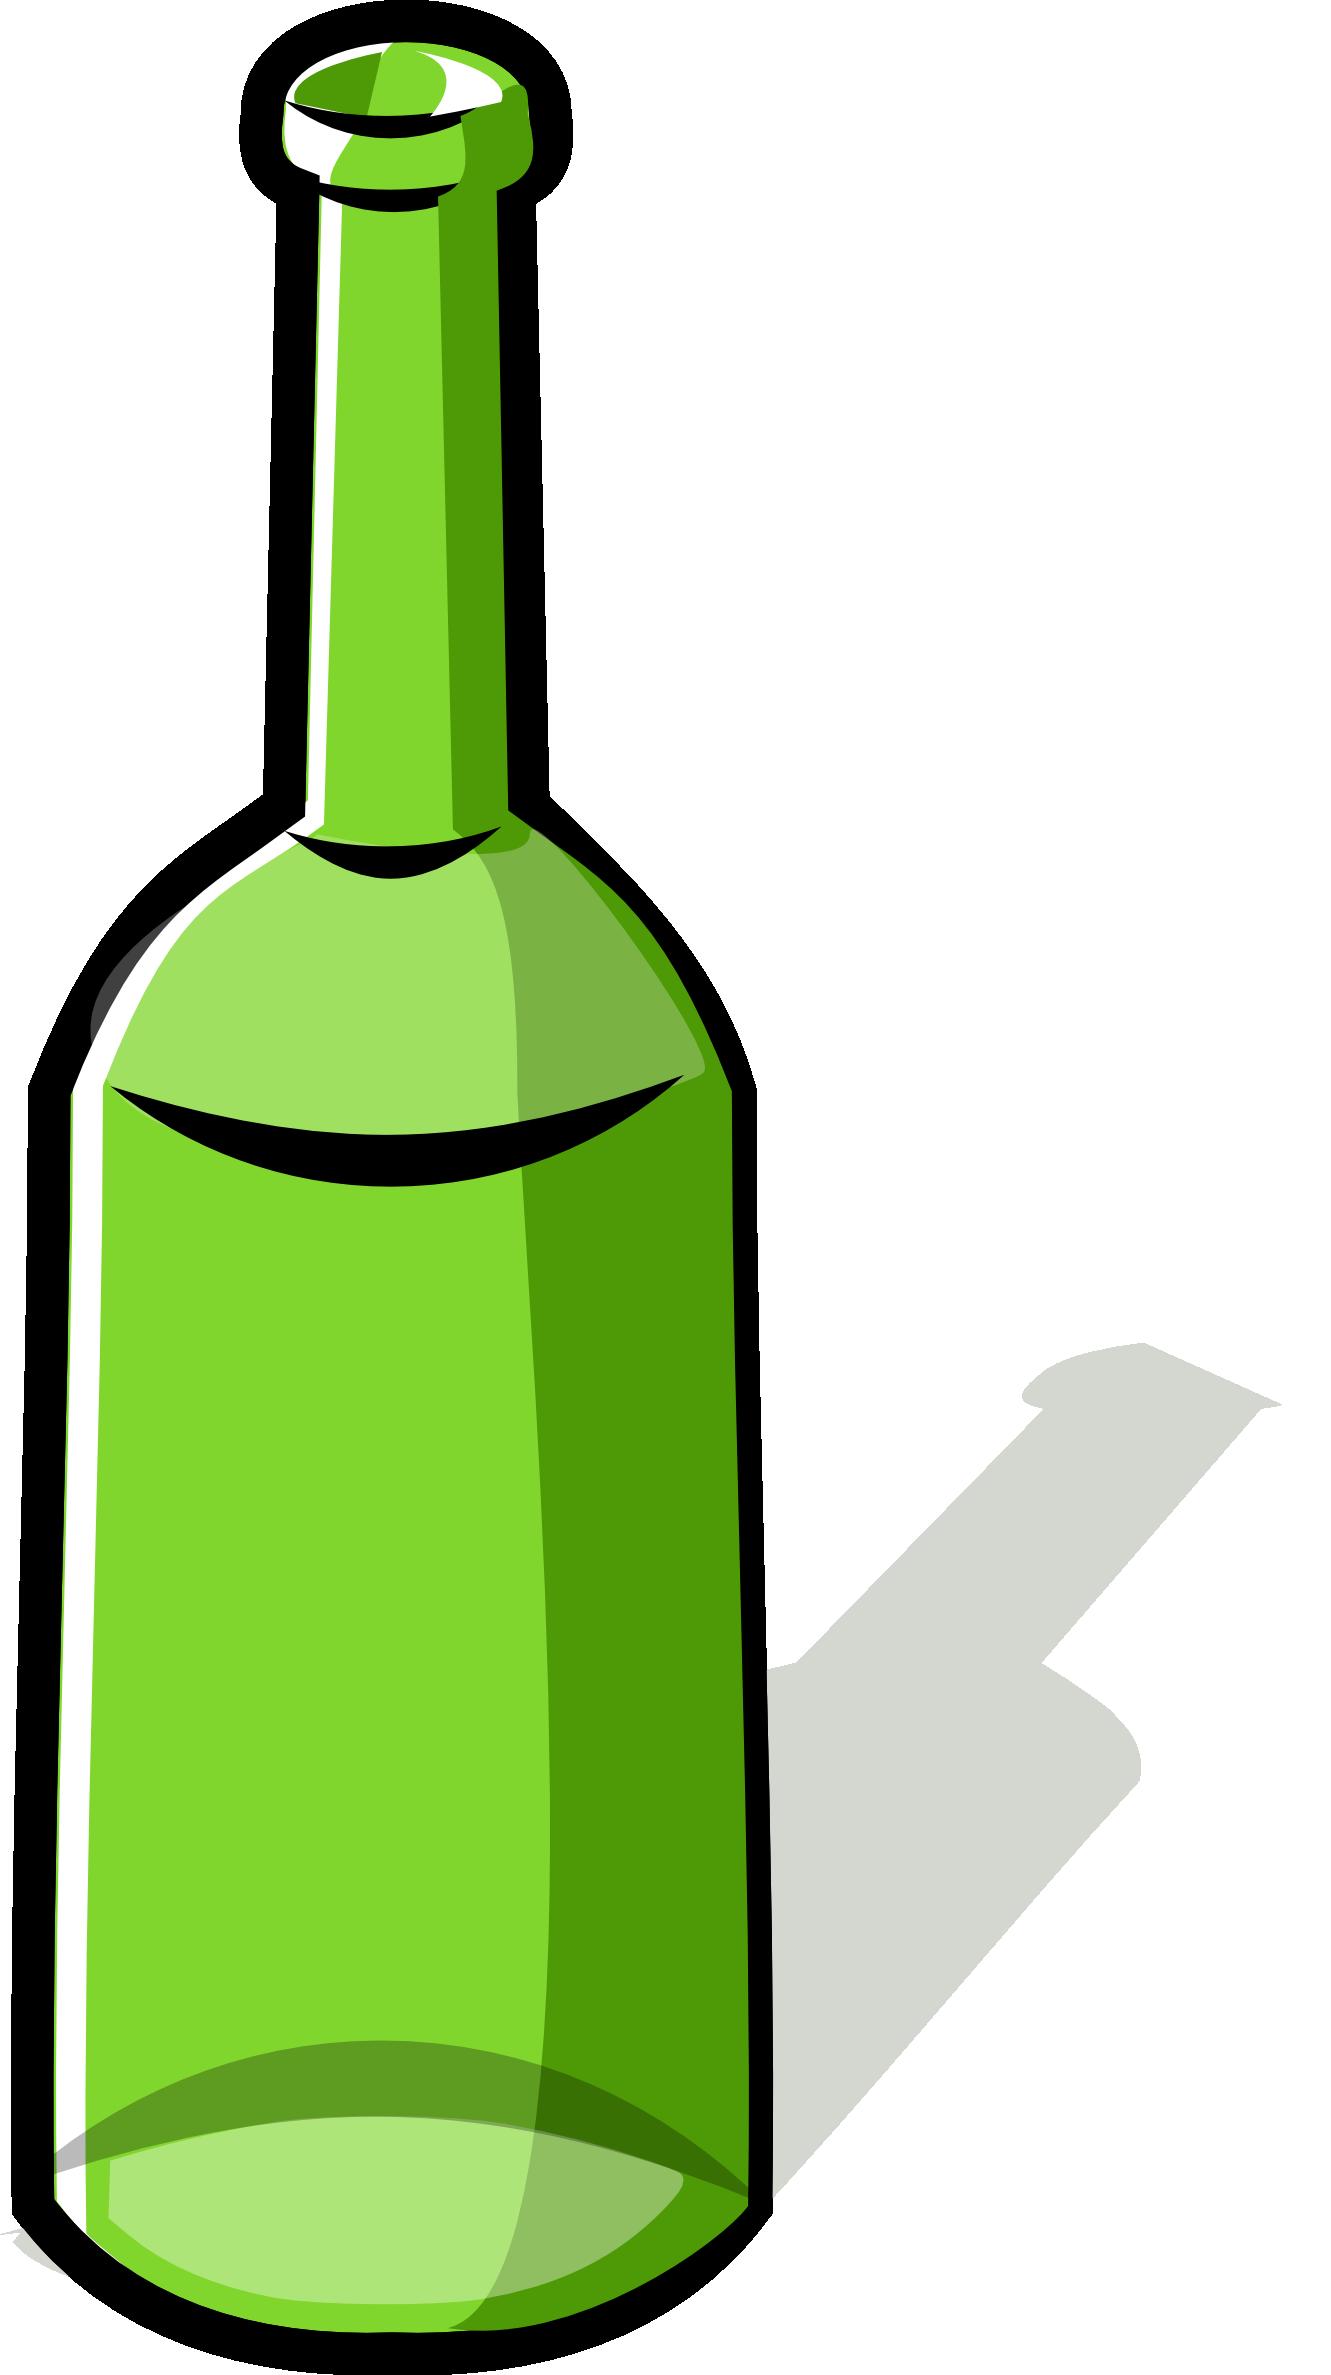 Beer bottle clip art png, Beer bottle clip art png.